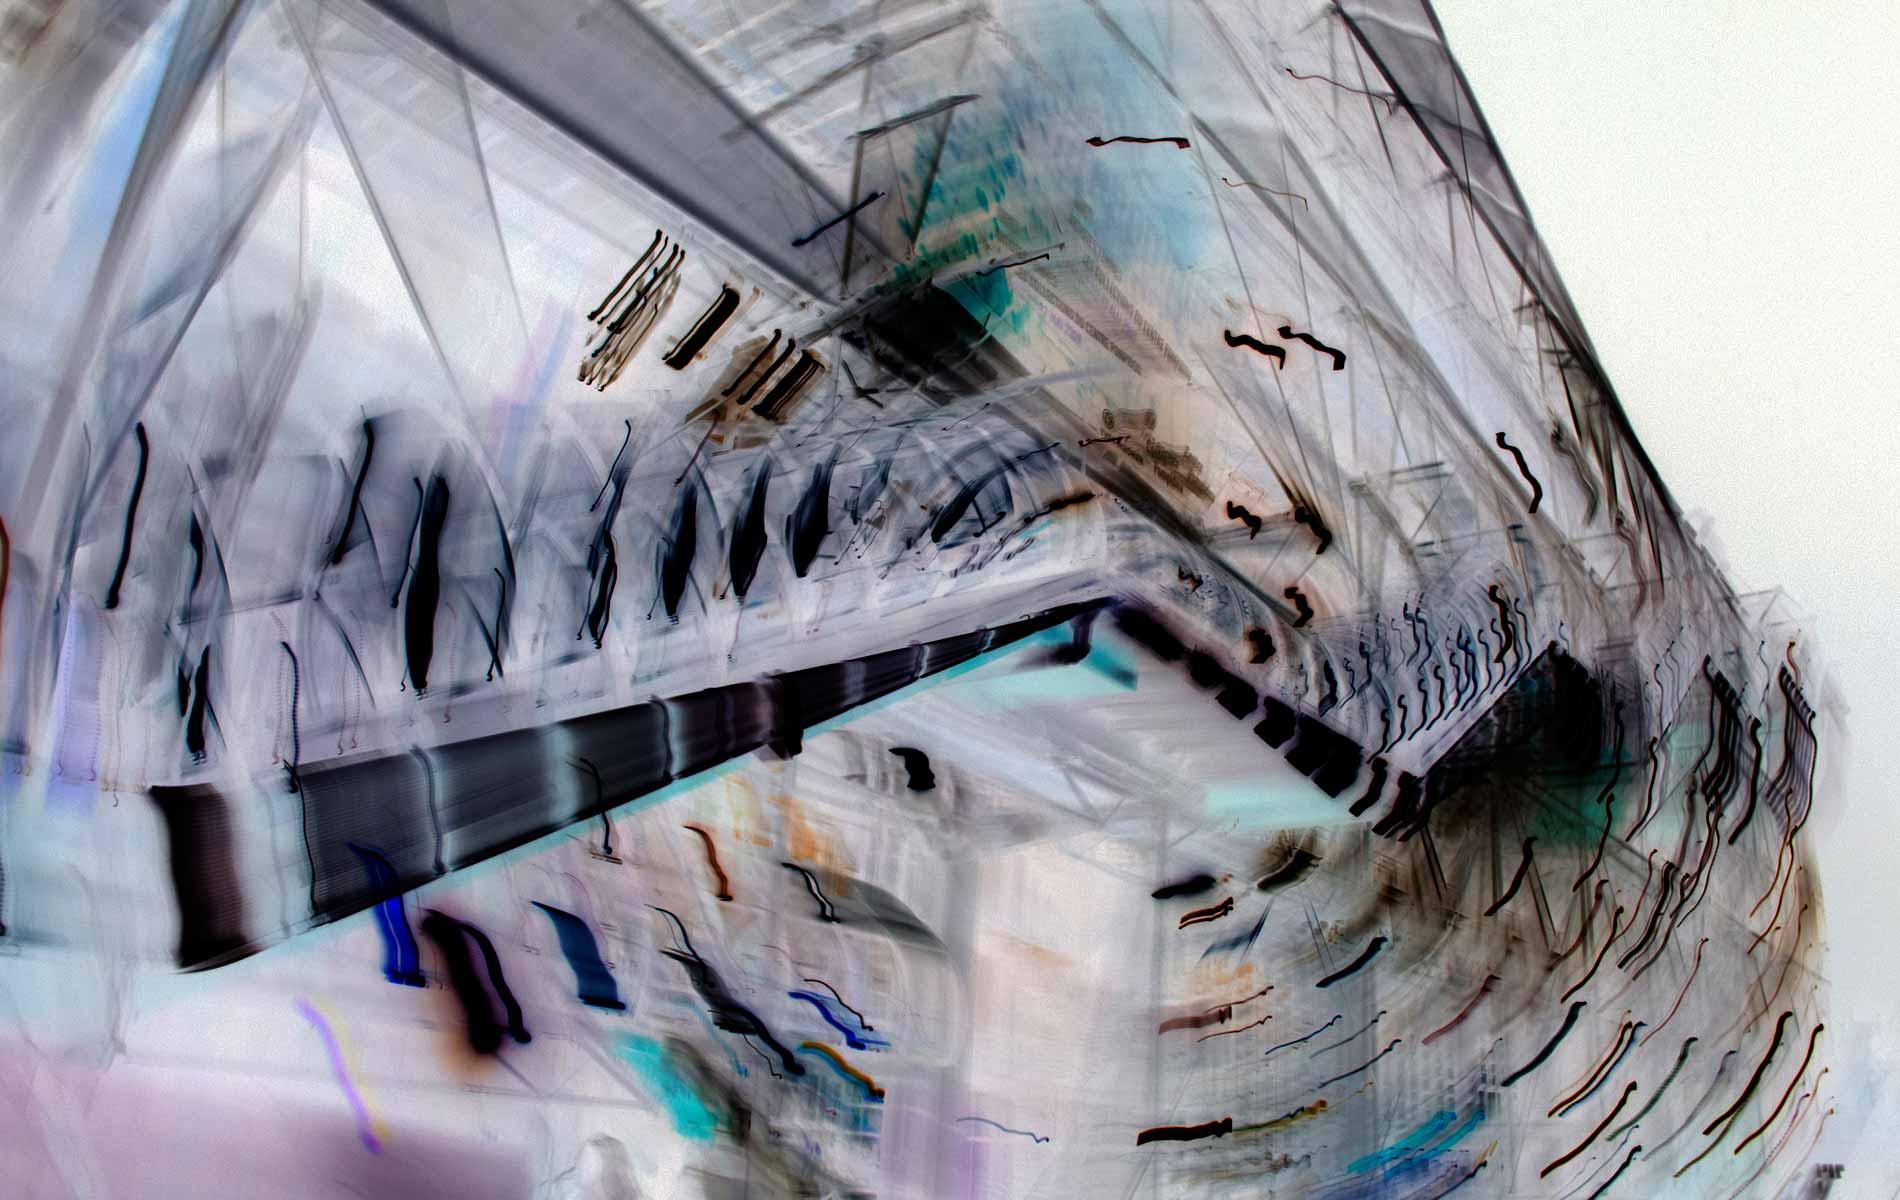 3. Musée Dynamique n. 1  -  Dynamic Museum n.1 - © Graziano Villa